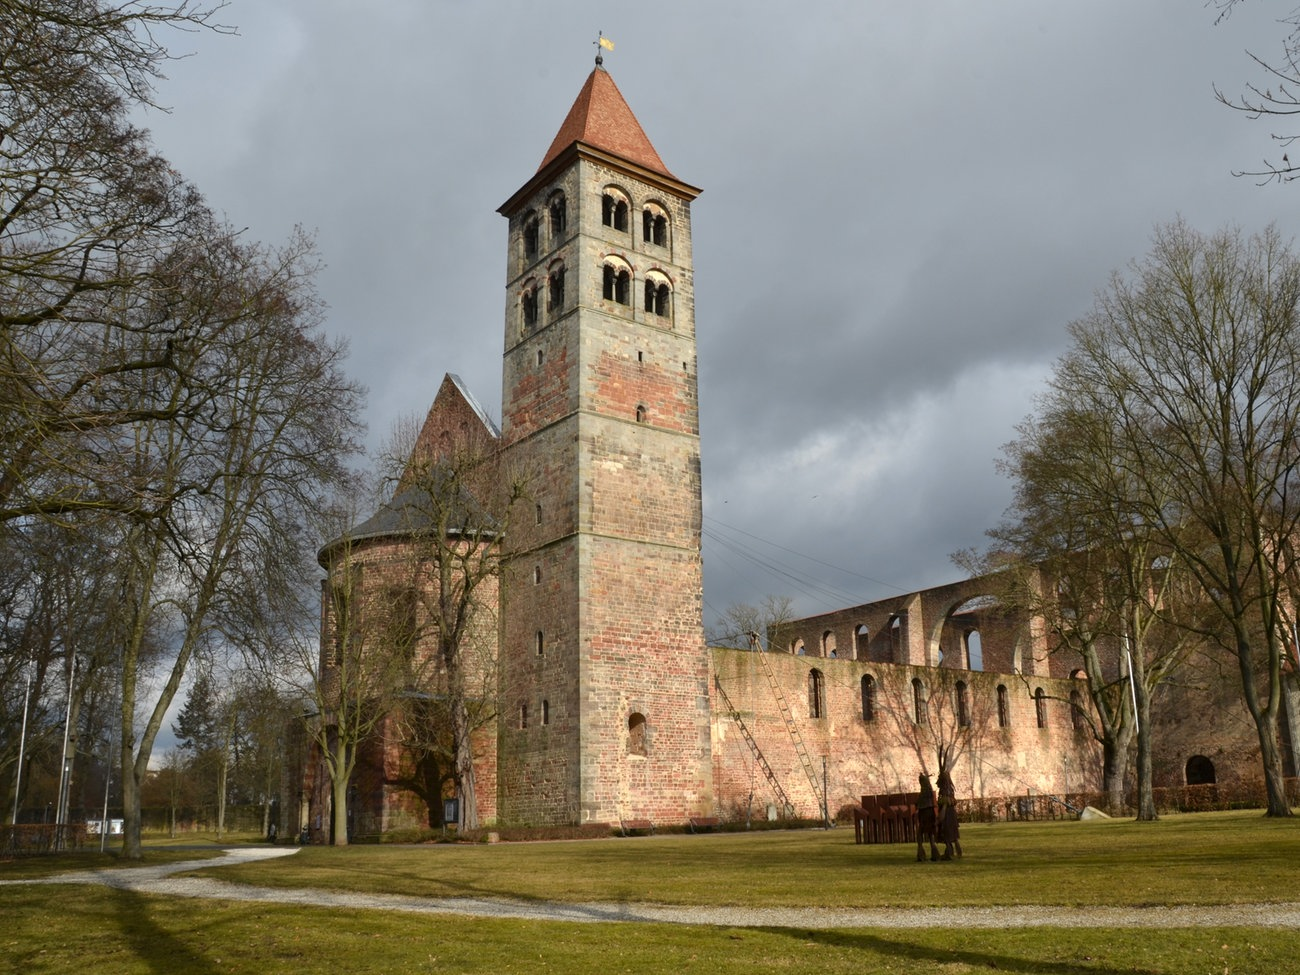 Bad Hersfeld Stiftsruine Mit Lullusglocke Hr4 De Alle Orte